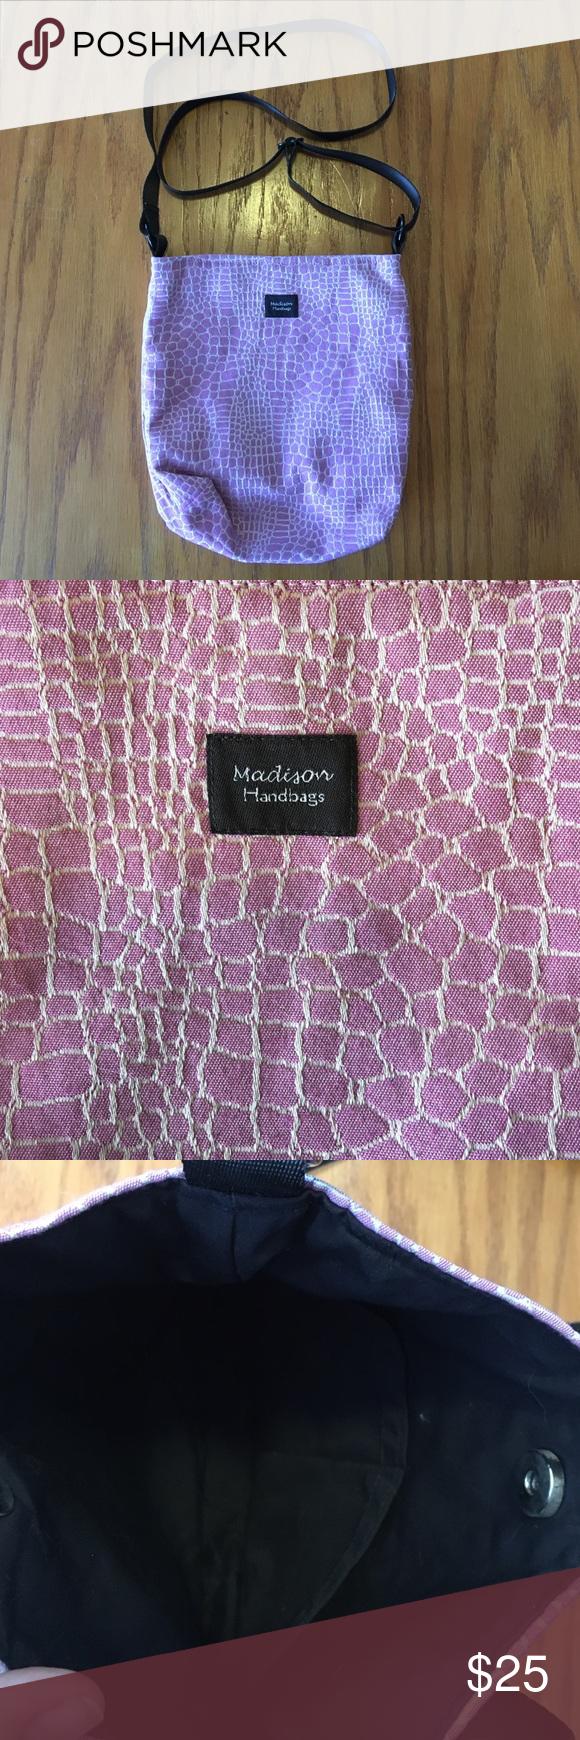 b11979dfed8b Madison Handbags Crossbody bag  made in USA Handmade in Troy